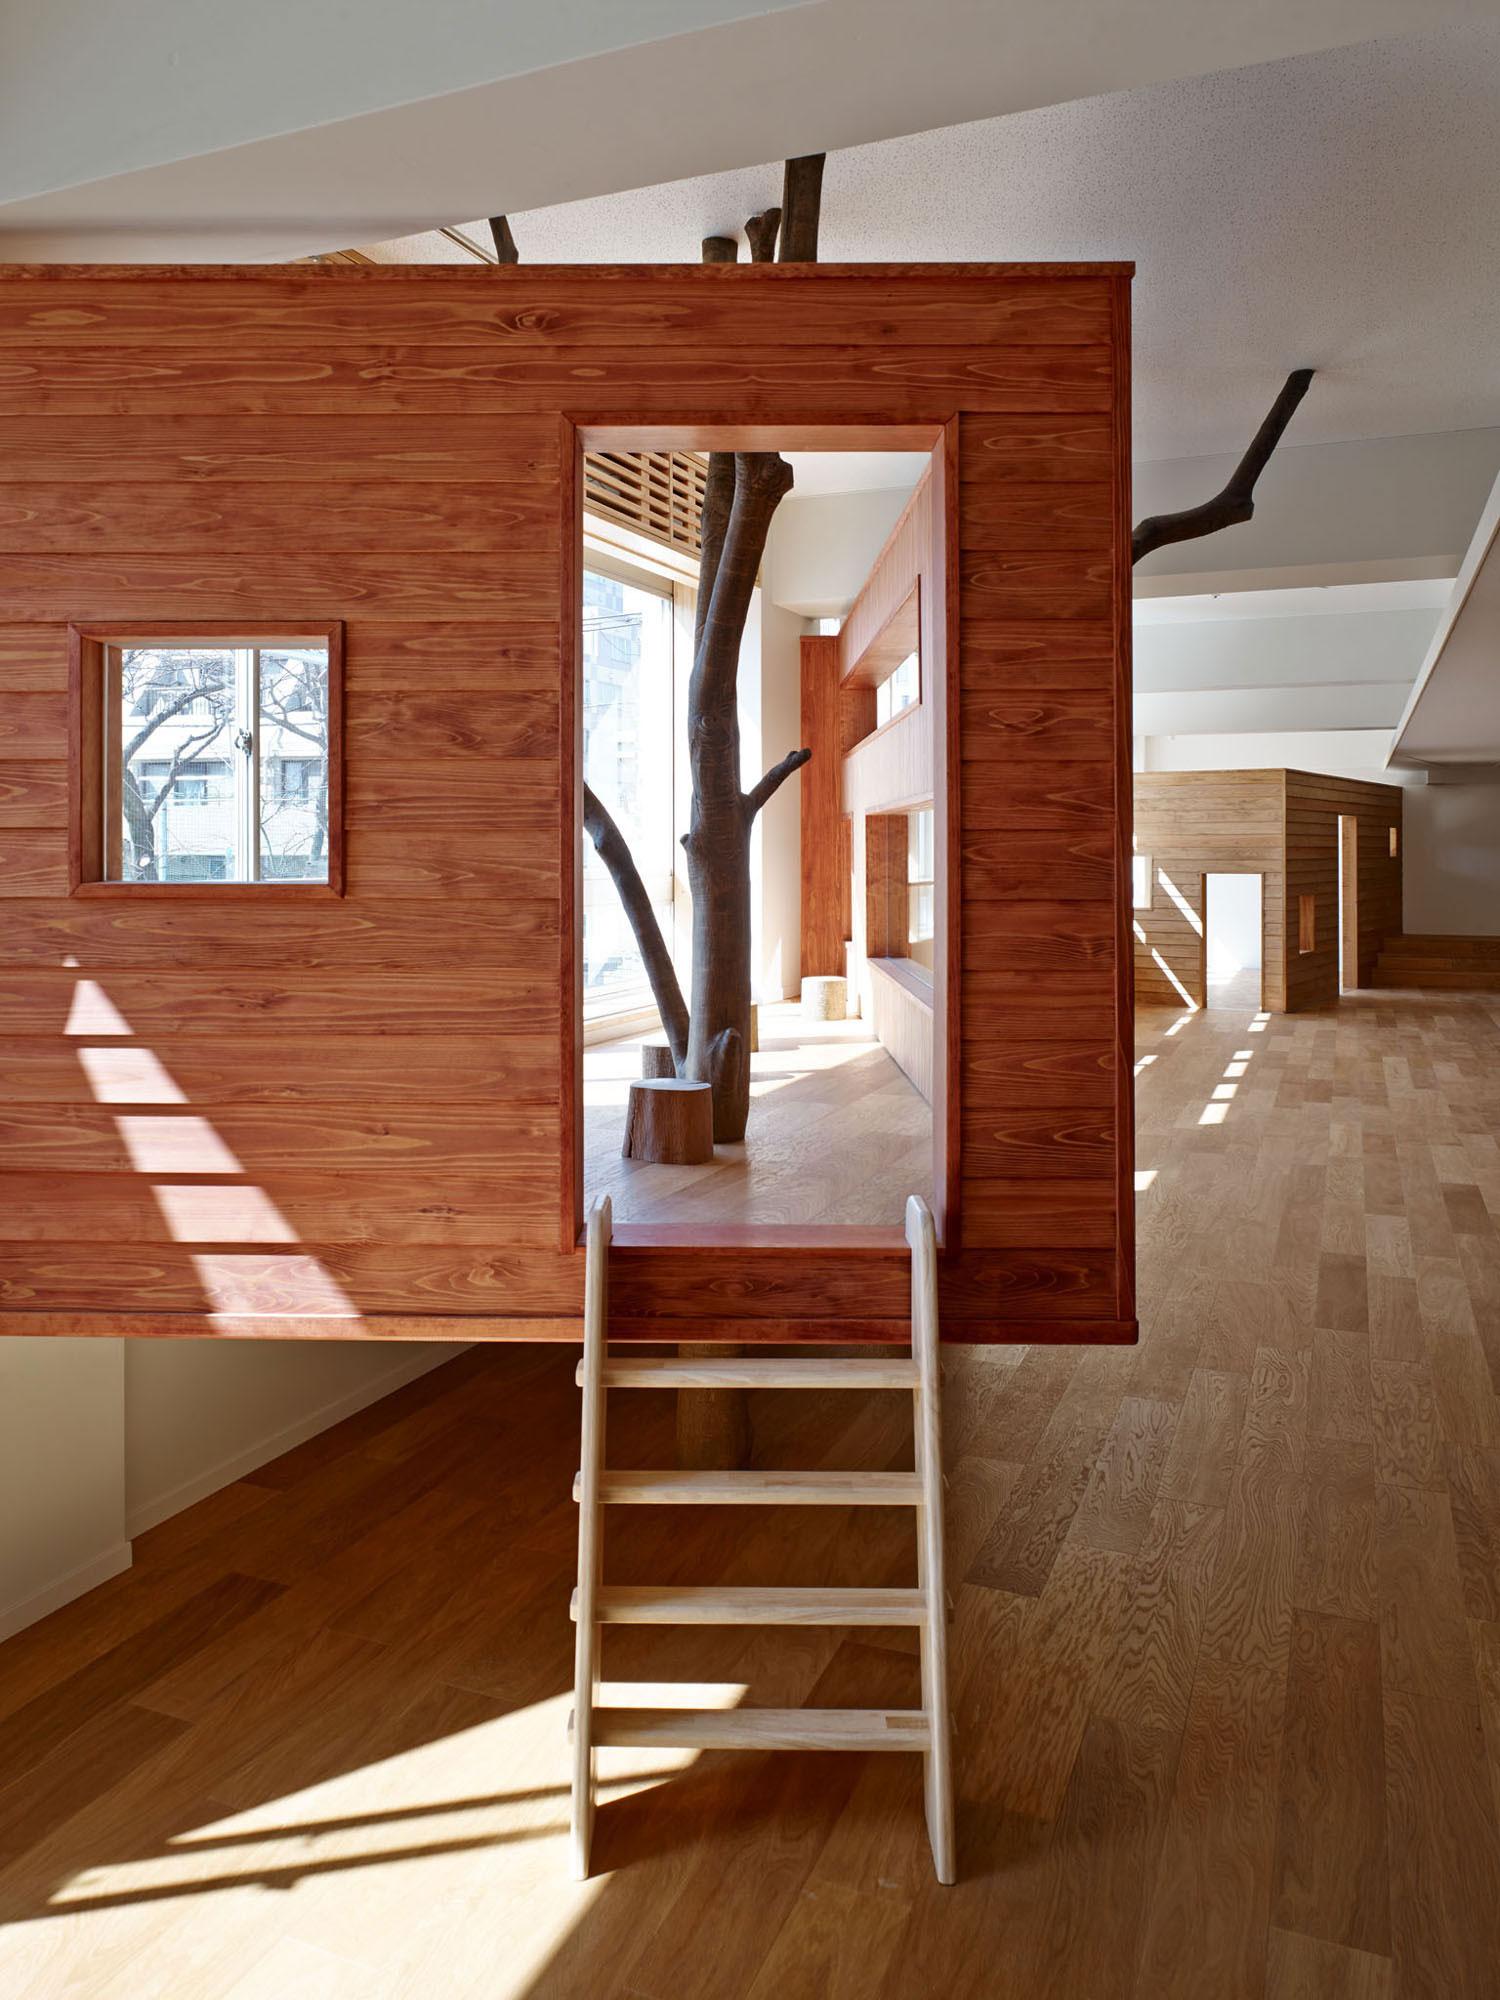 Mokumoku Kindergarten in Tokyo, Japan by 16A Inc Architects | Yellowtrace.